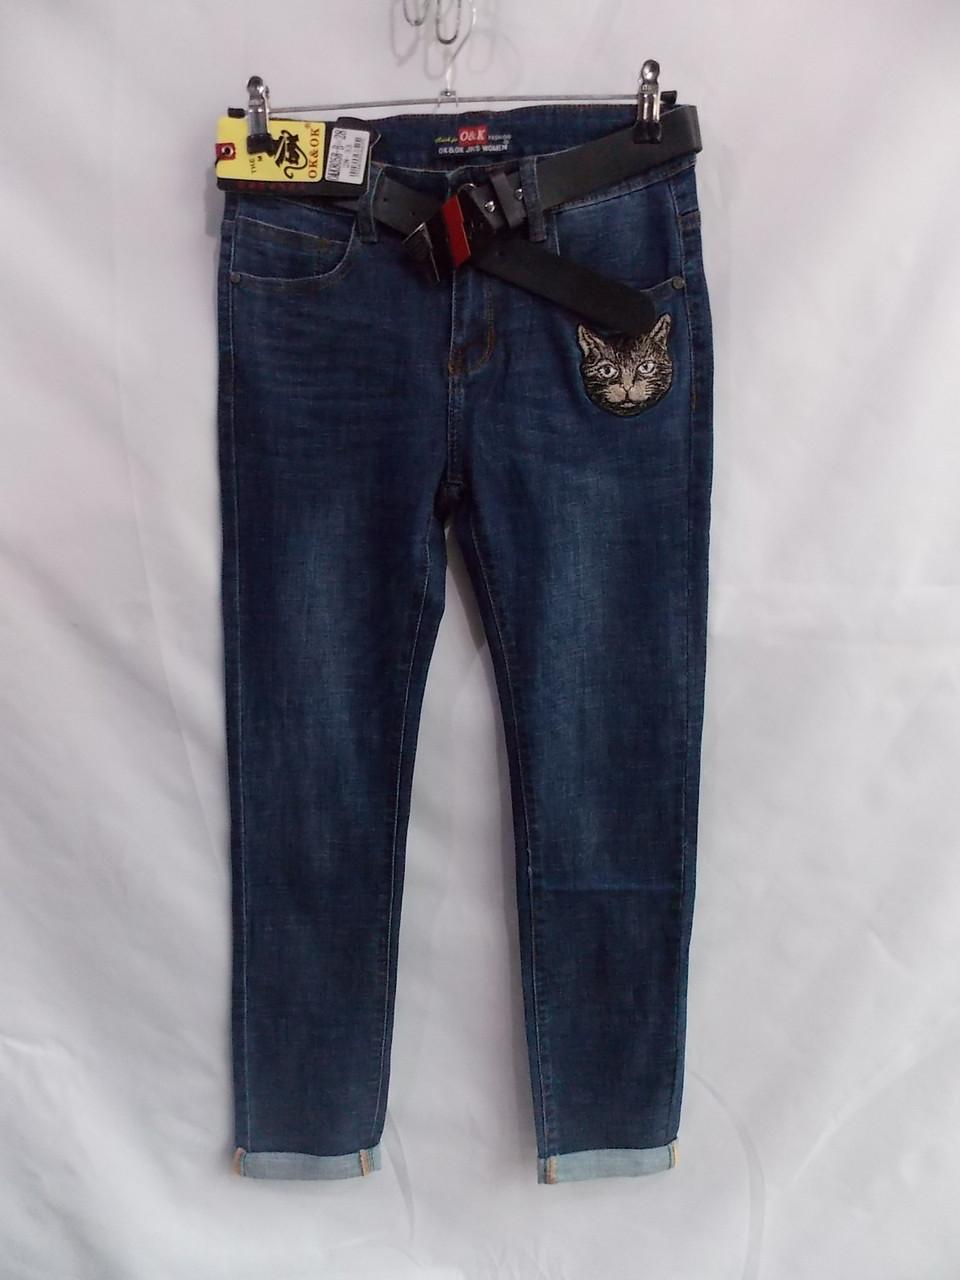 Джинсы женская Полу-Батал оптом со склада в одессе